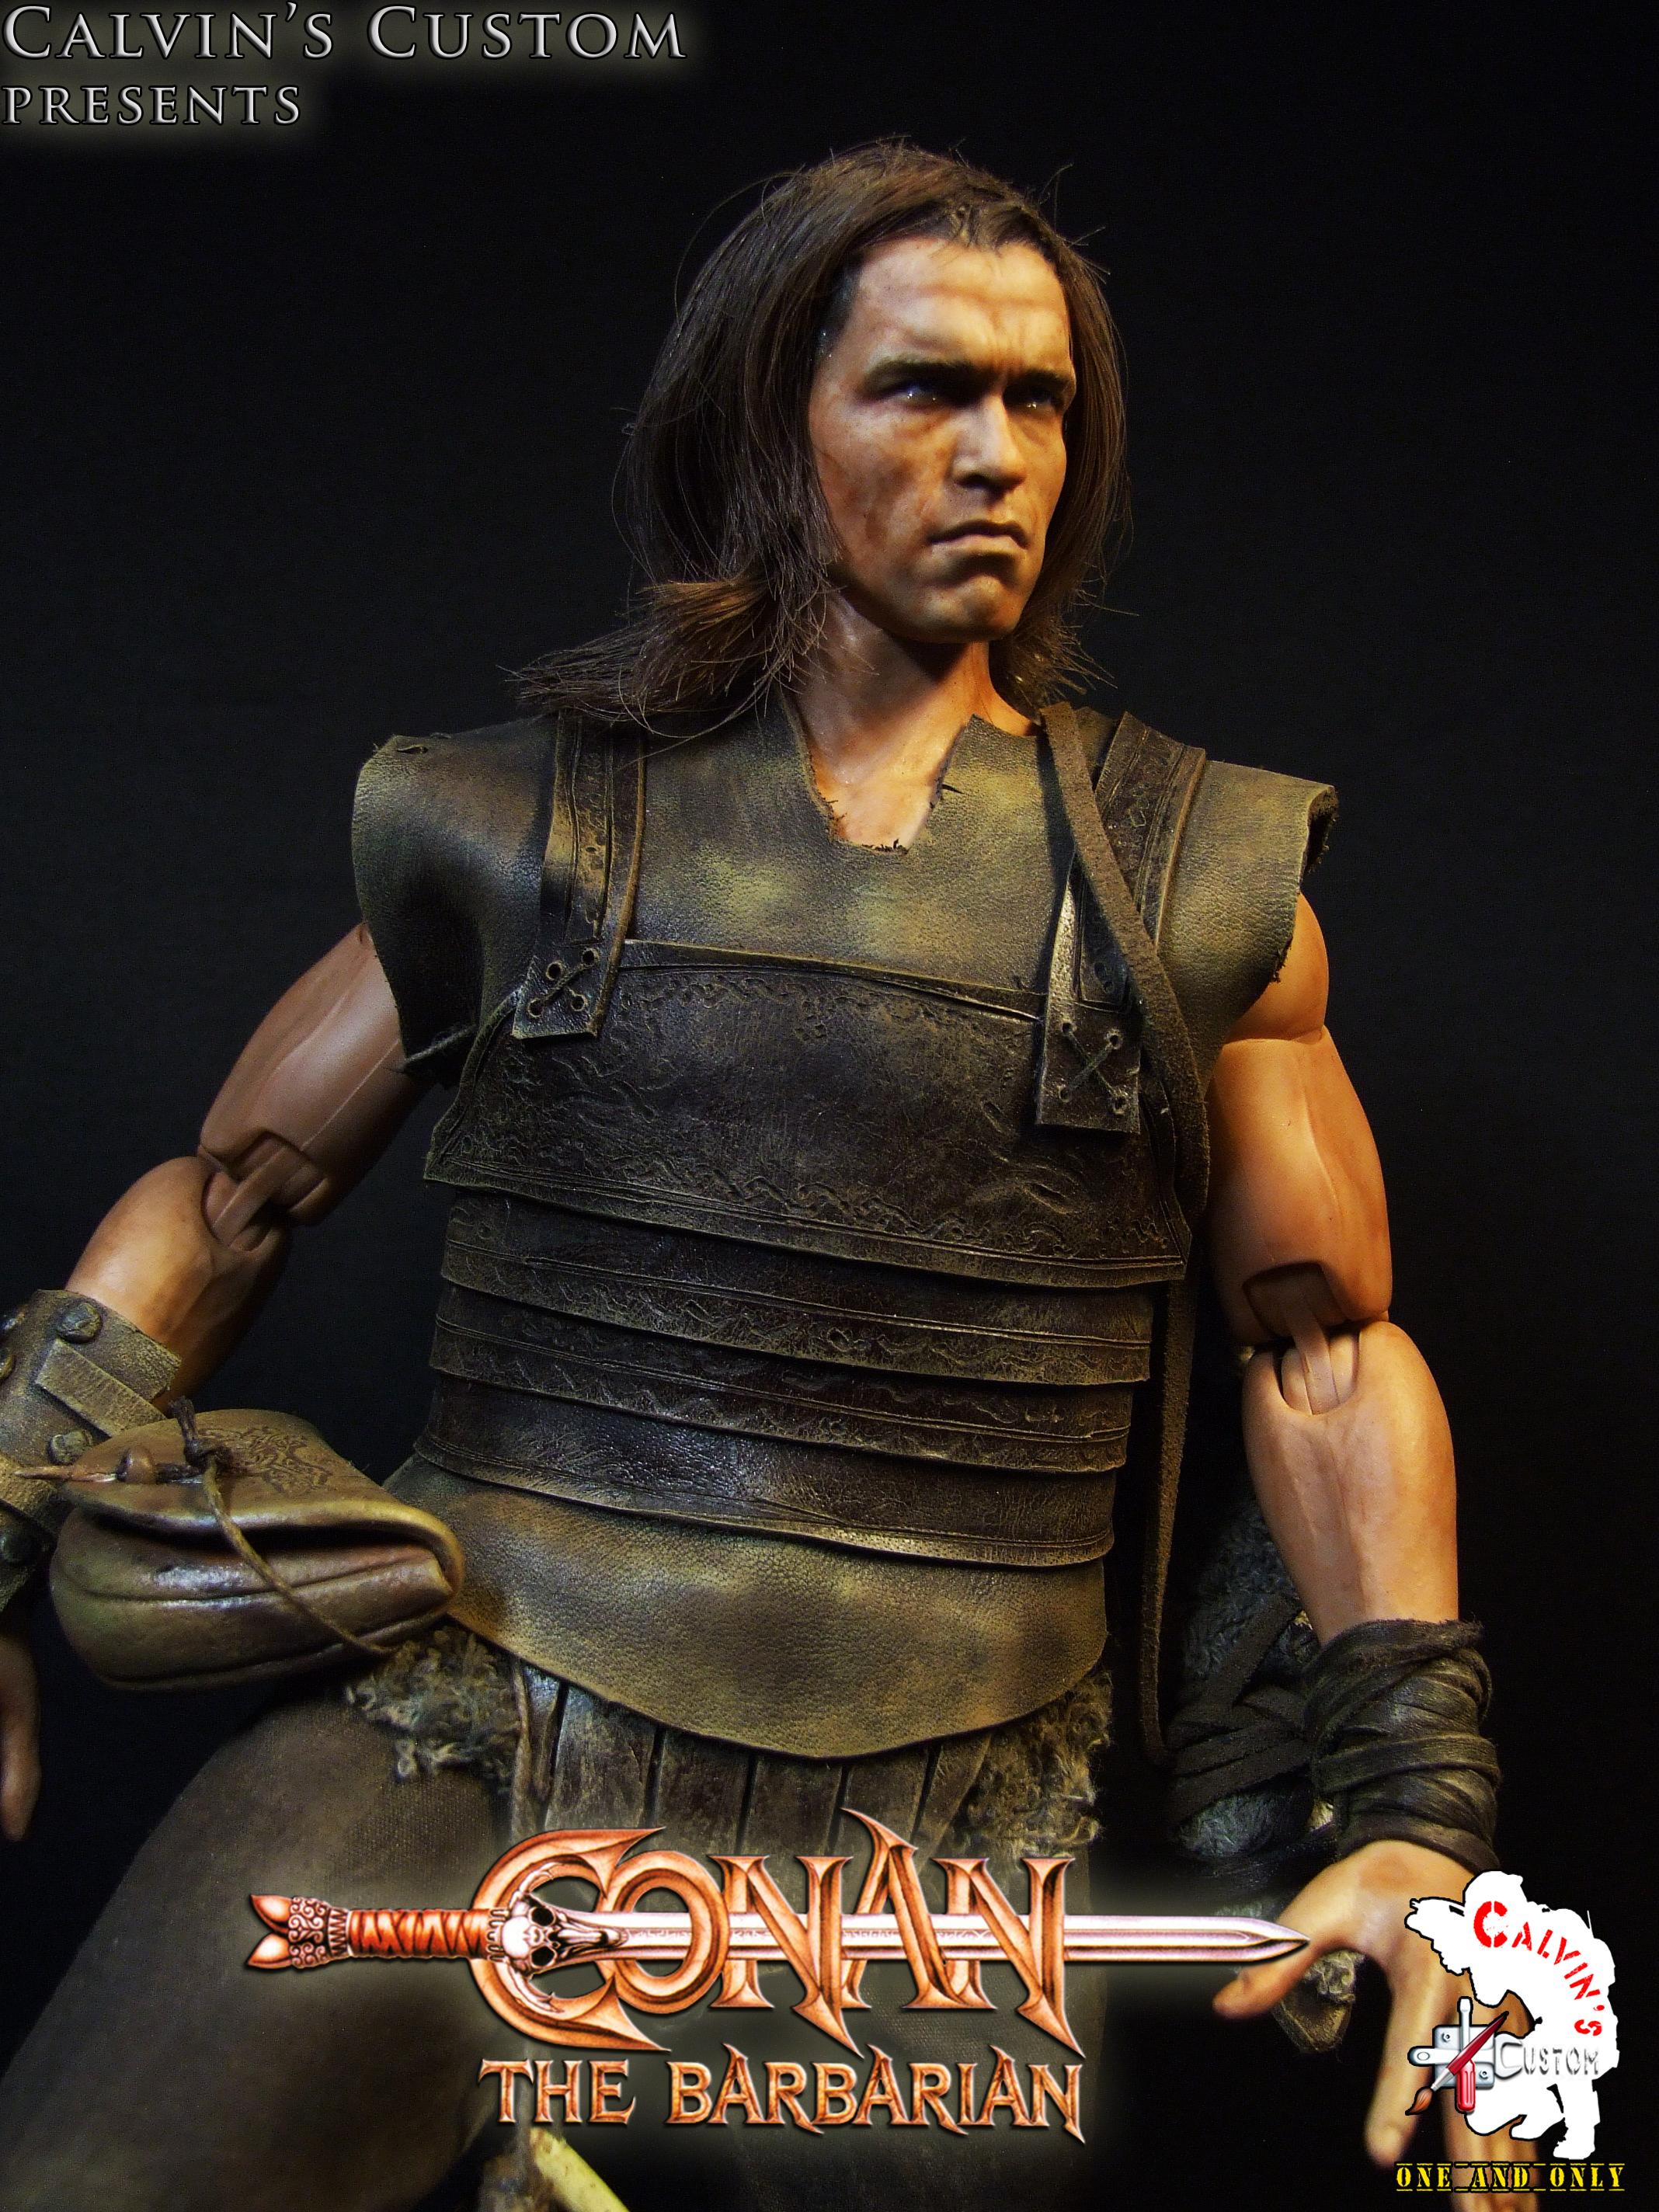 Calvin's Custom One Sixth scale Conan the Barbarian custom figure